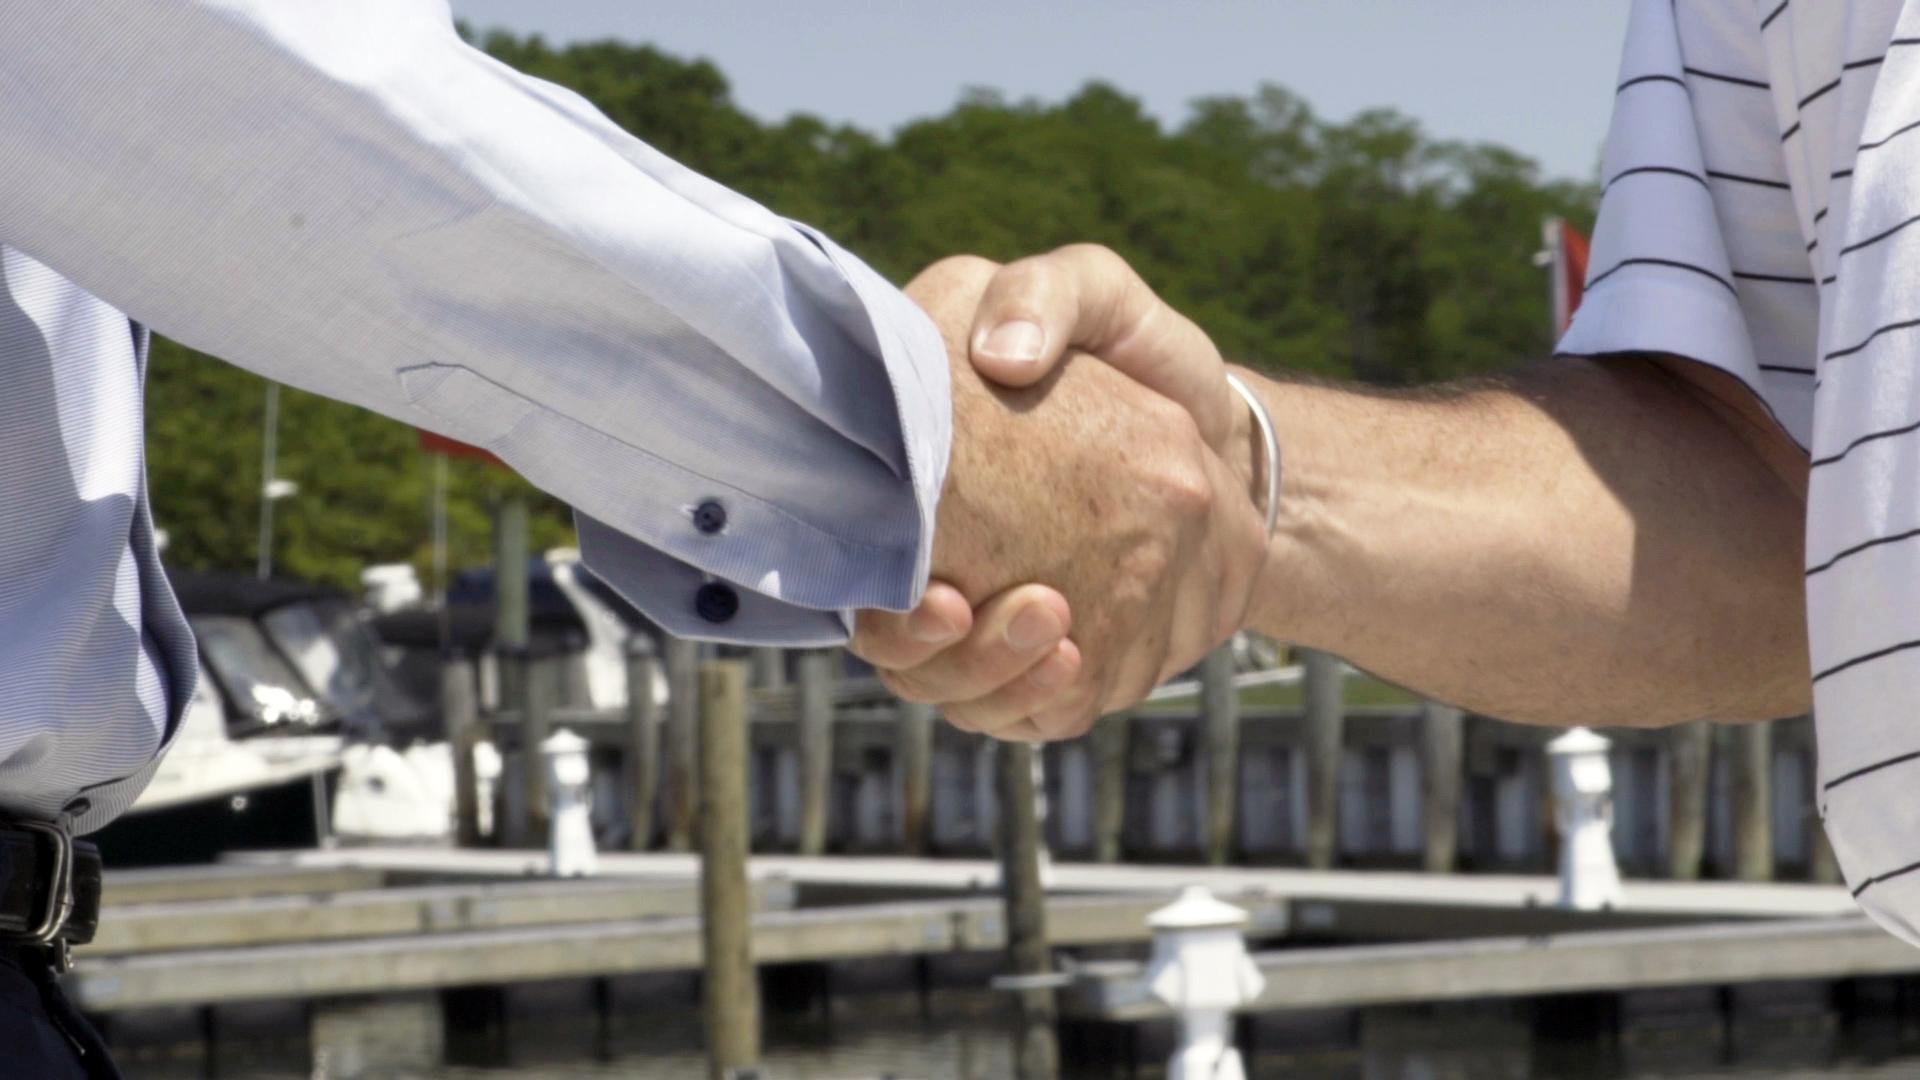 Handshake over a maritime background.